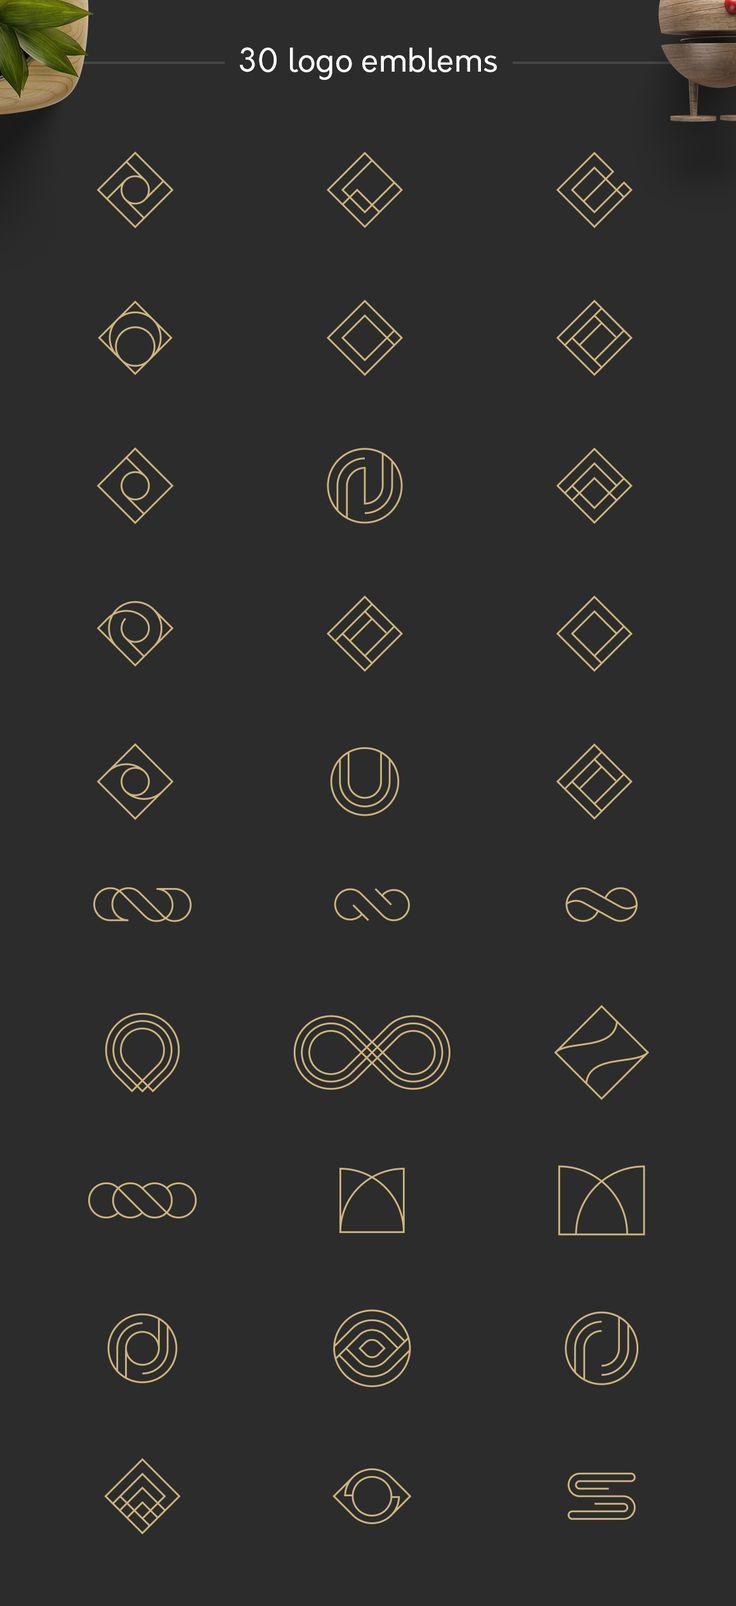 Geometric Logos by Davide Bassu on @creativemarket